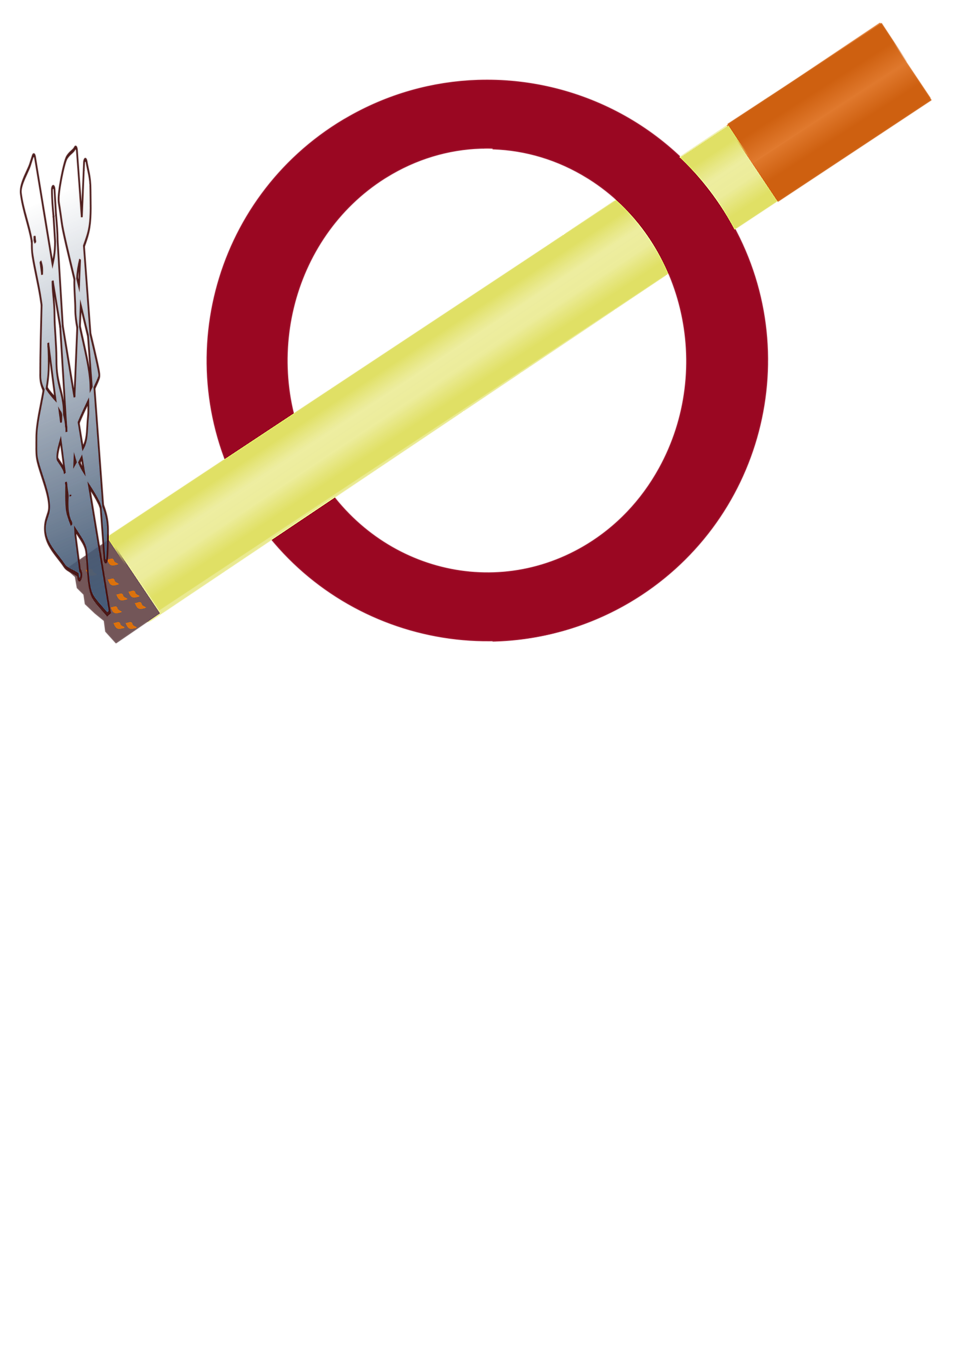 958x1355 No Smoking Free Stock Photo Illustration Of A No Smoking